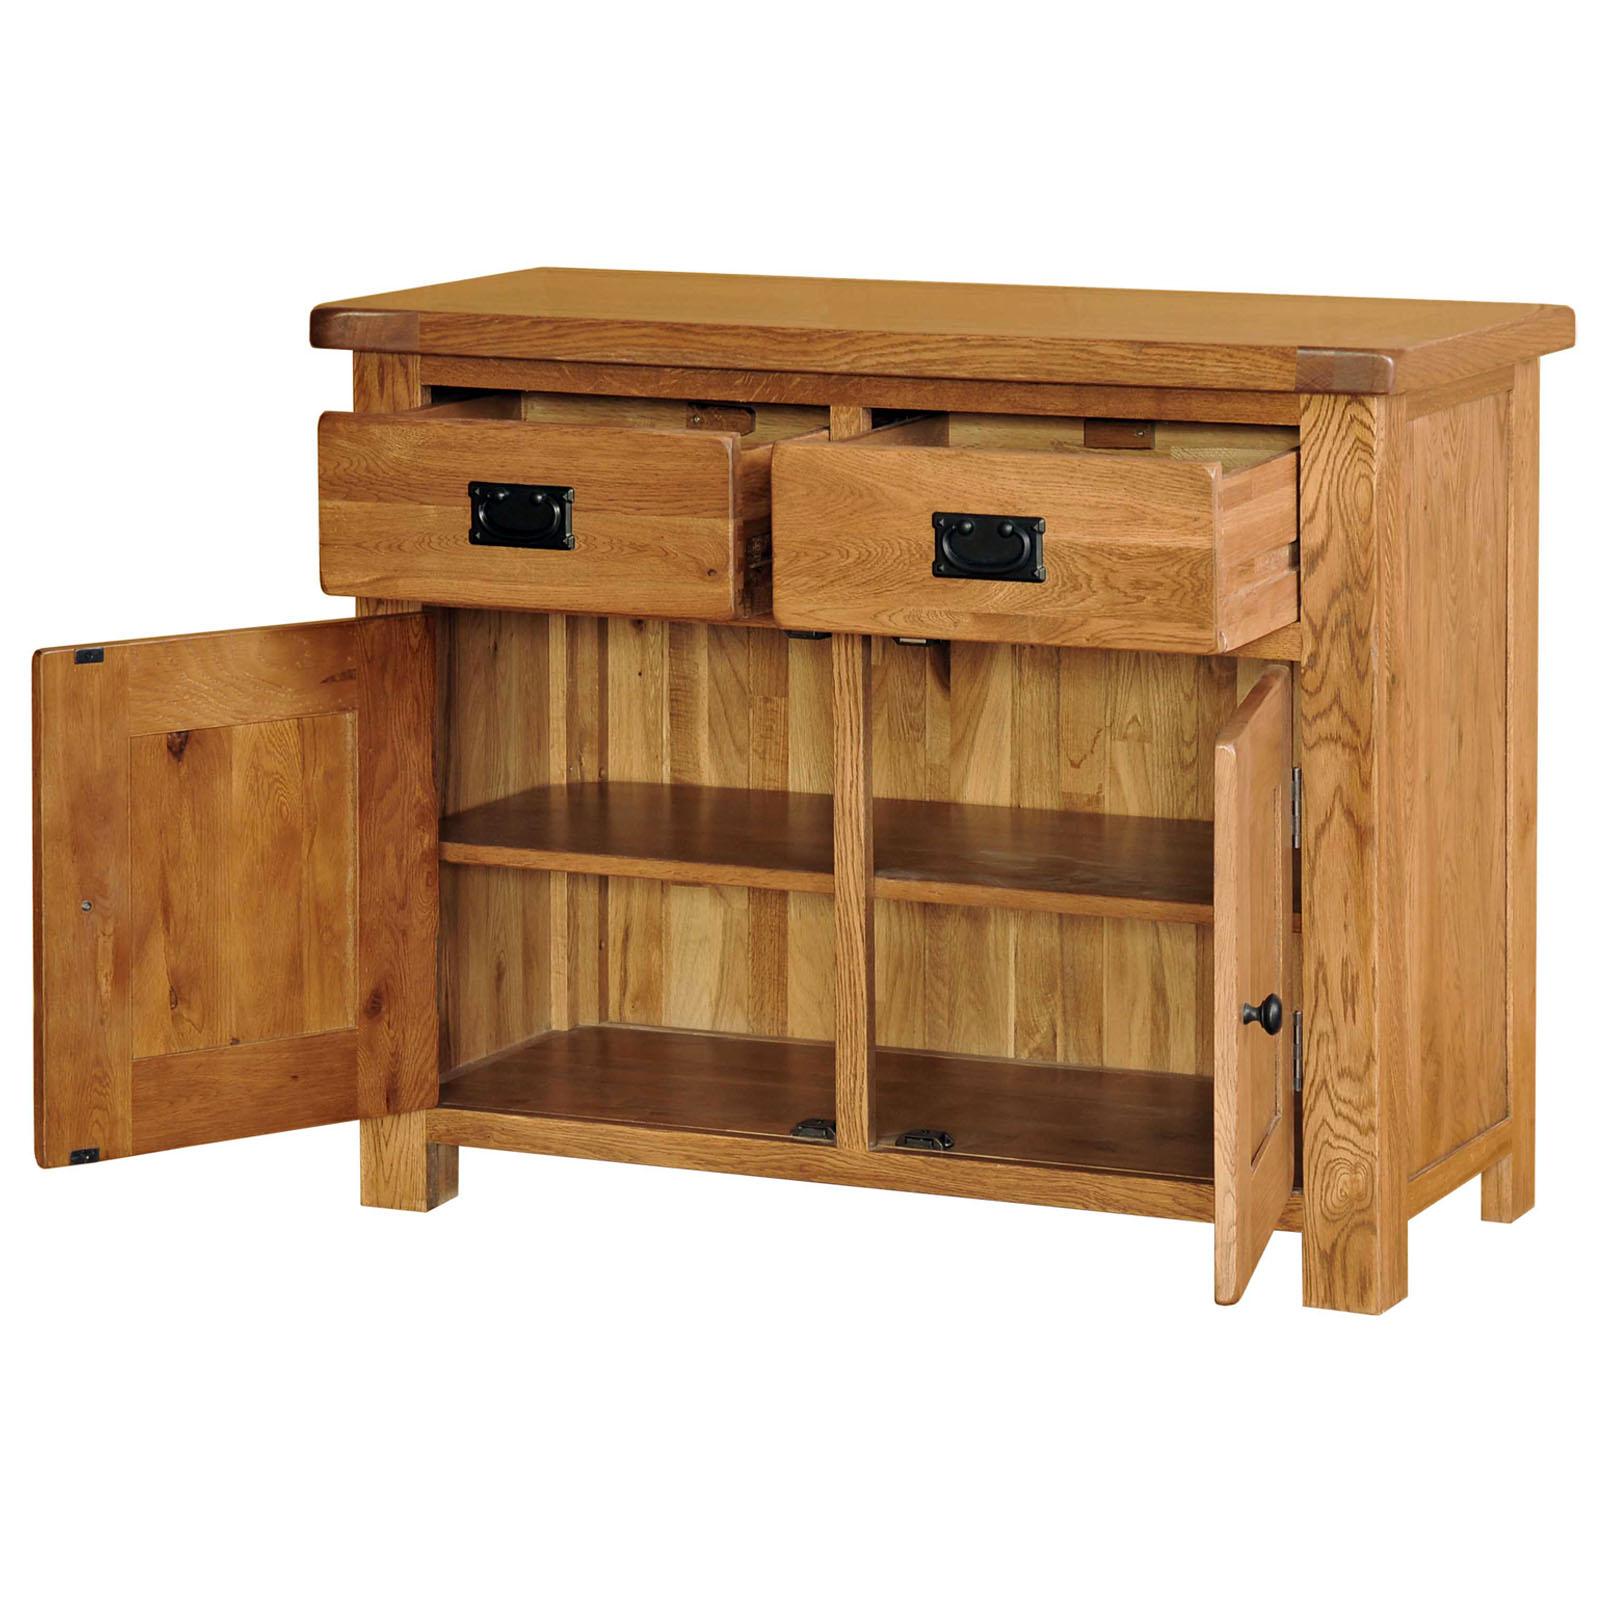 39 country oak 39 3ft wide sideboard dresser base realwoods for Sideboard real